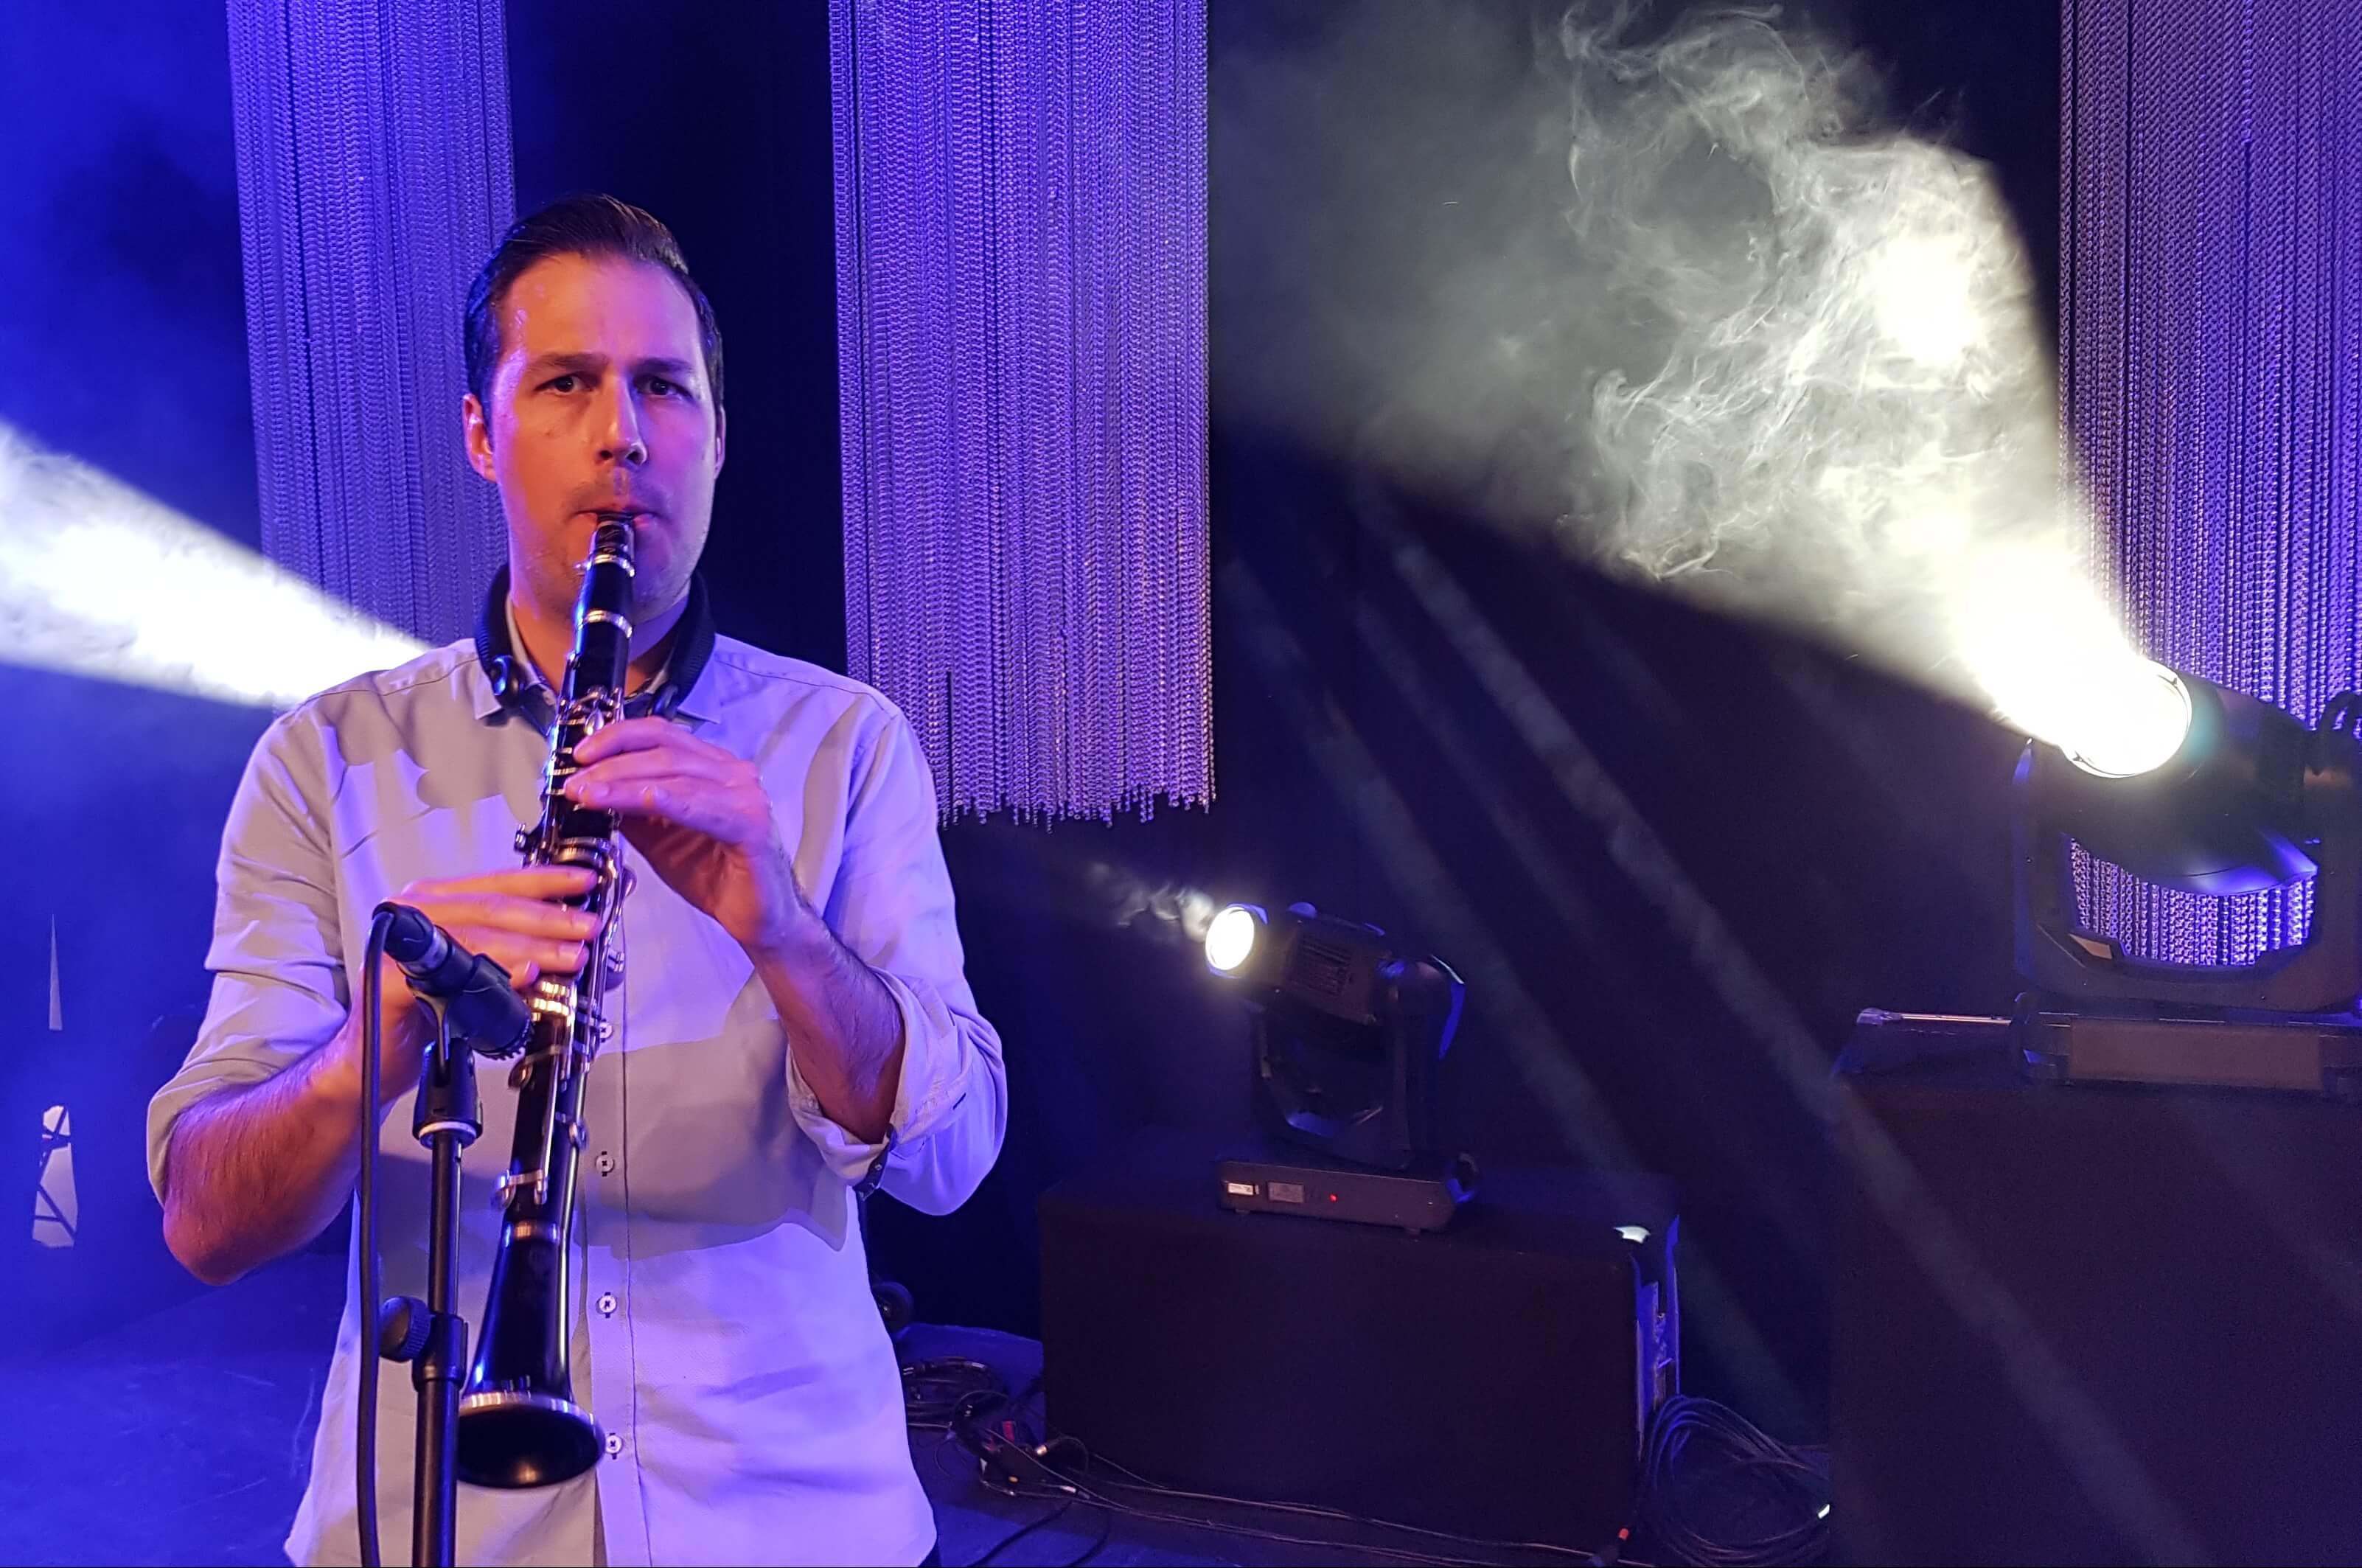 Clarinettiste pour concert jazz manouche